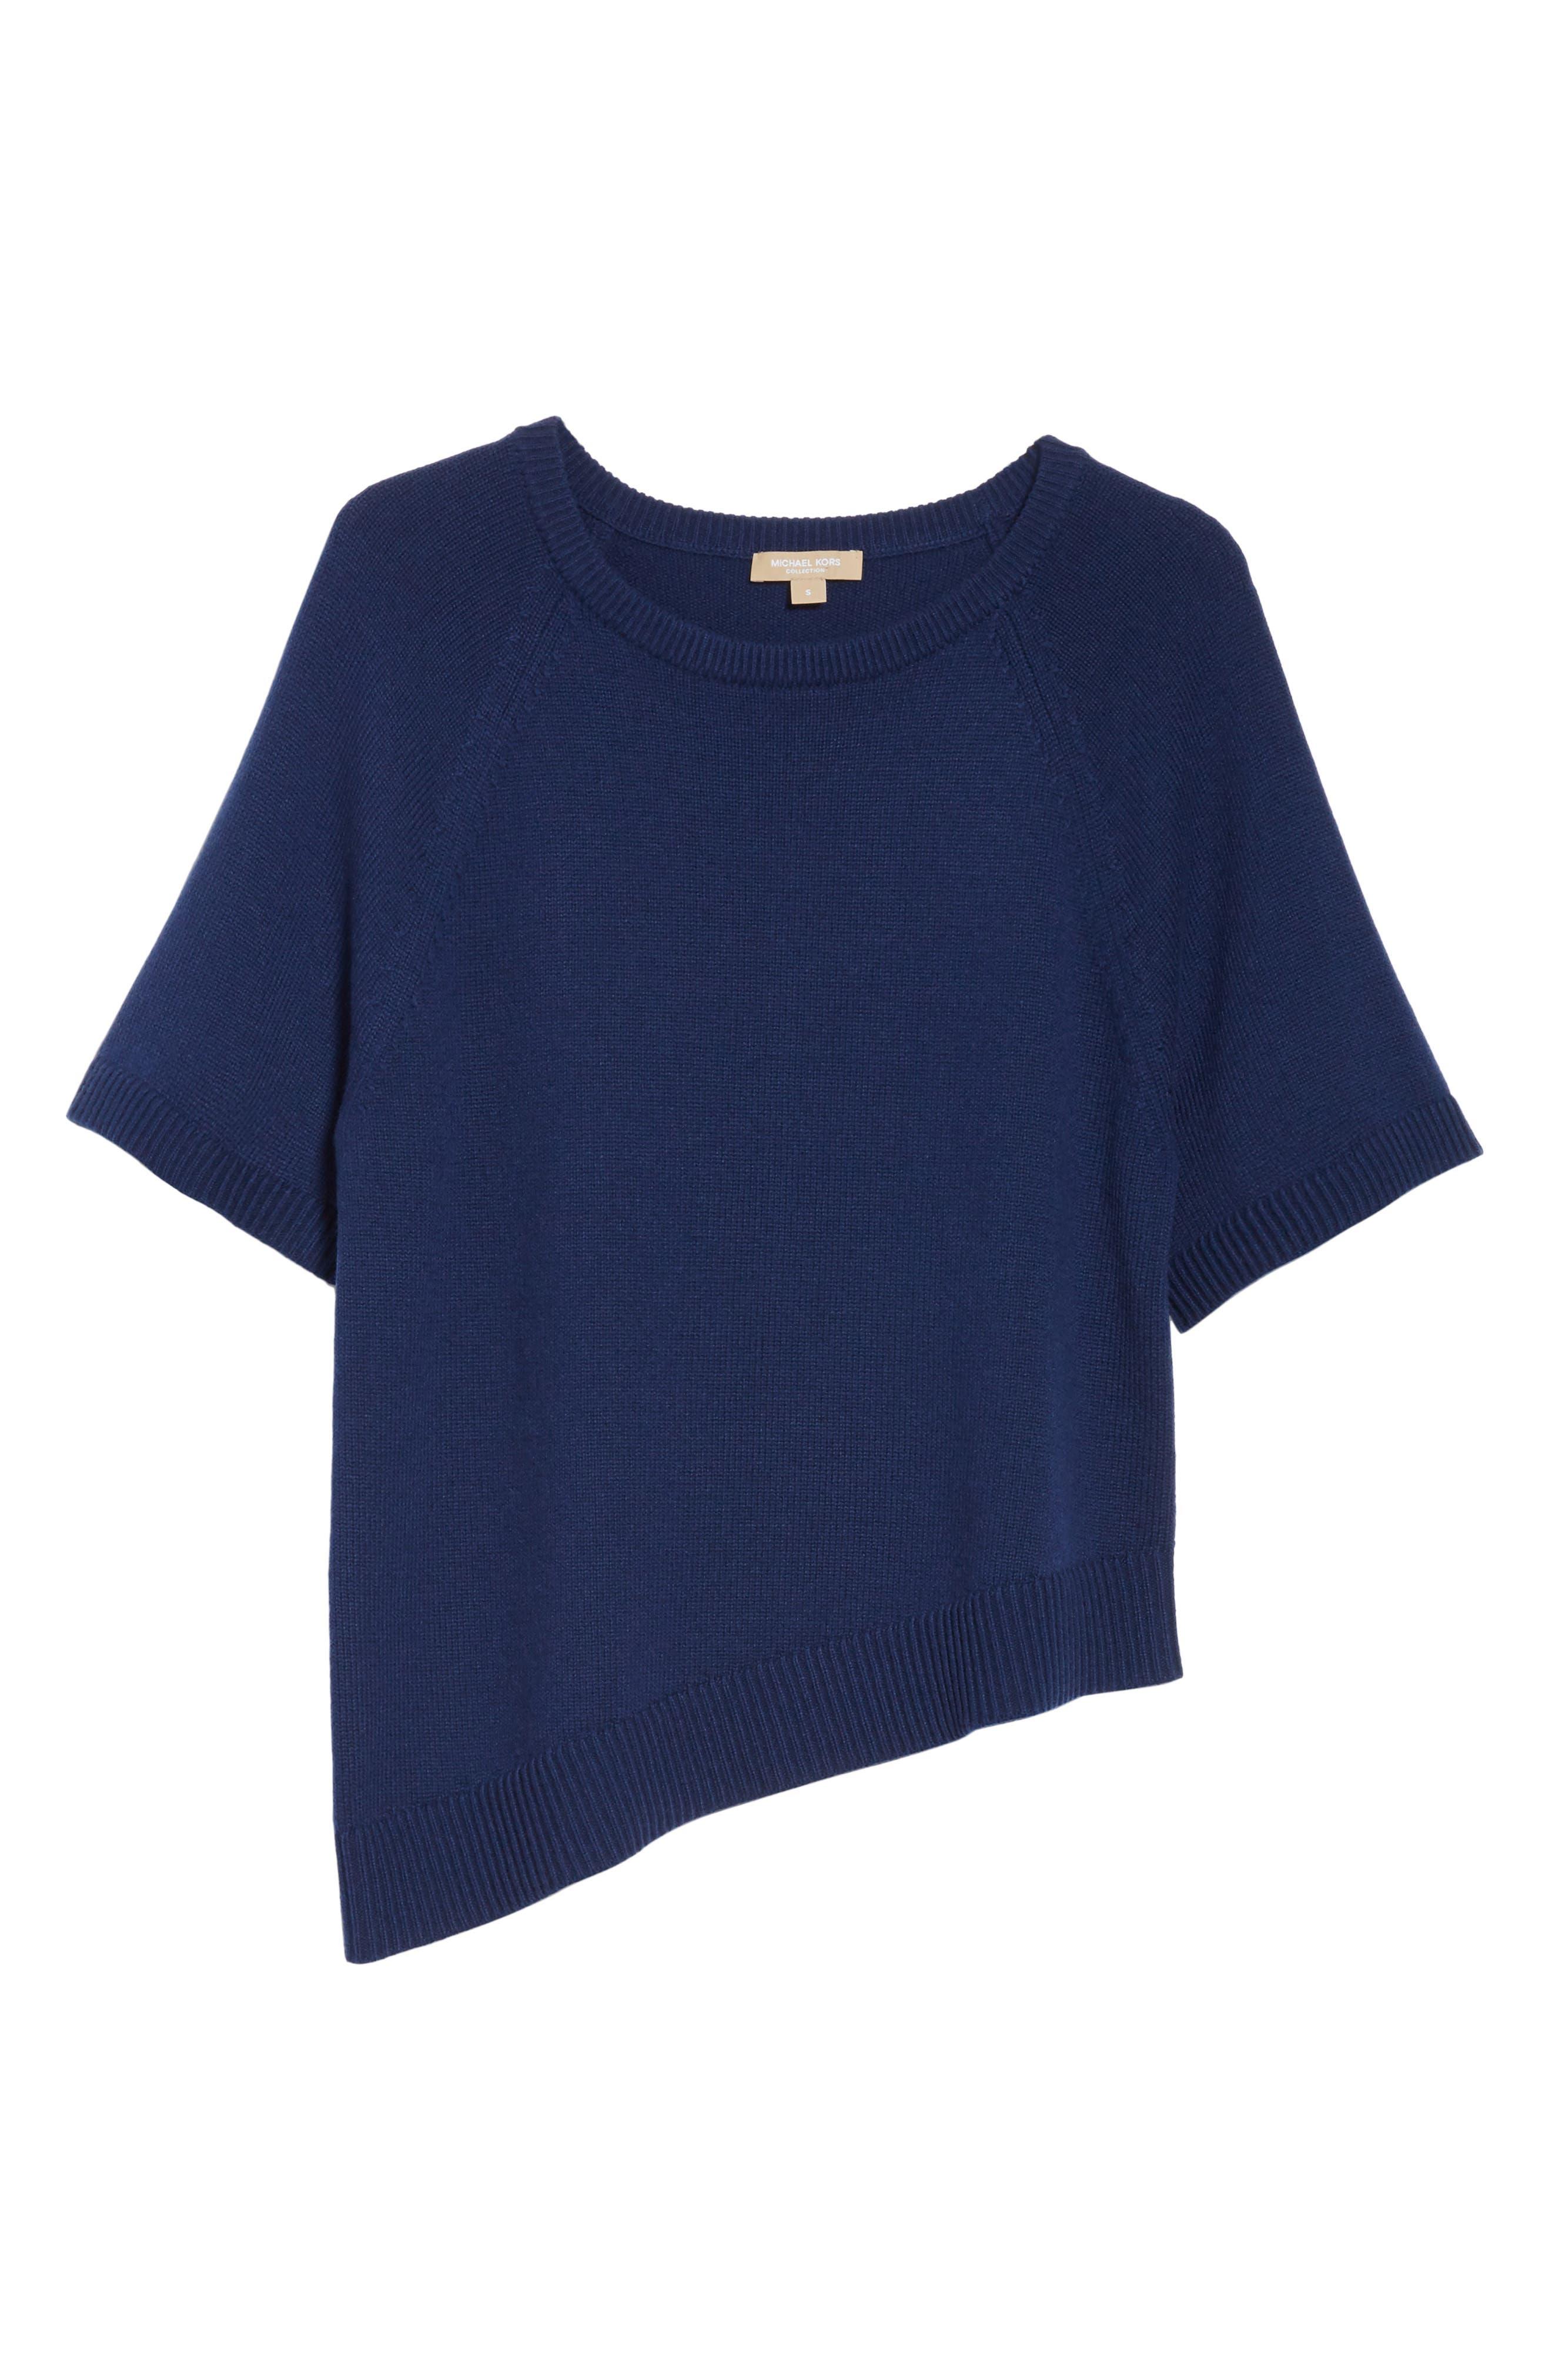 Asymmetrical Cashmere Pullover,                             Alternate thumbnail 6, color,                             489